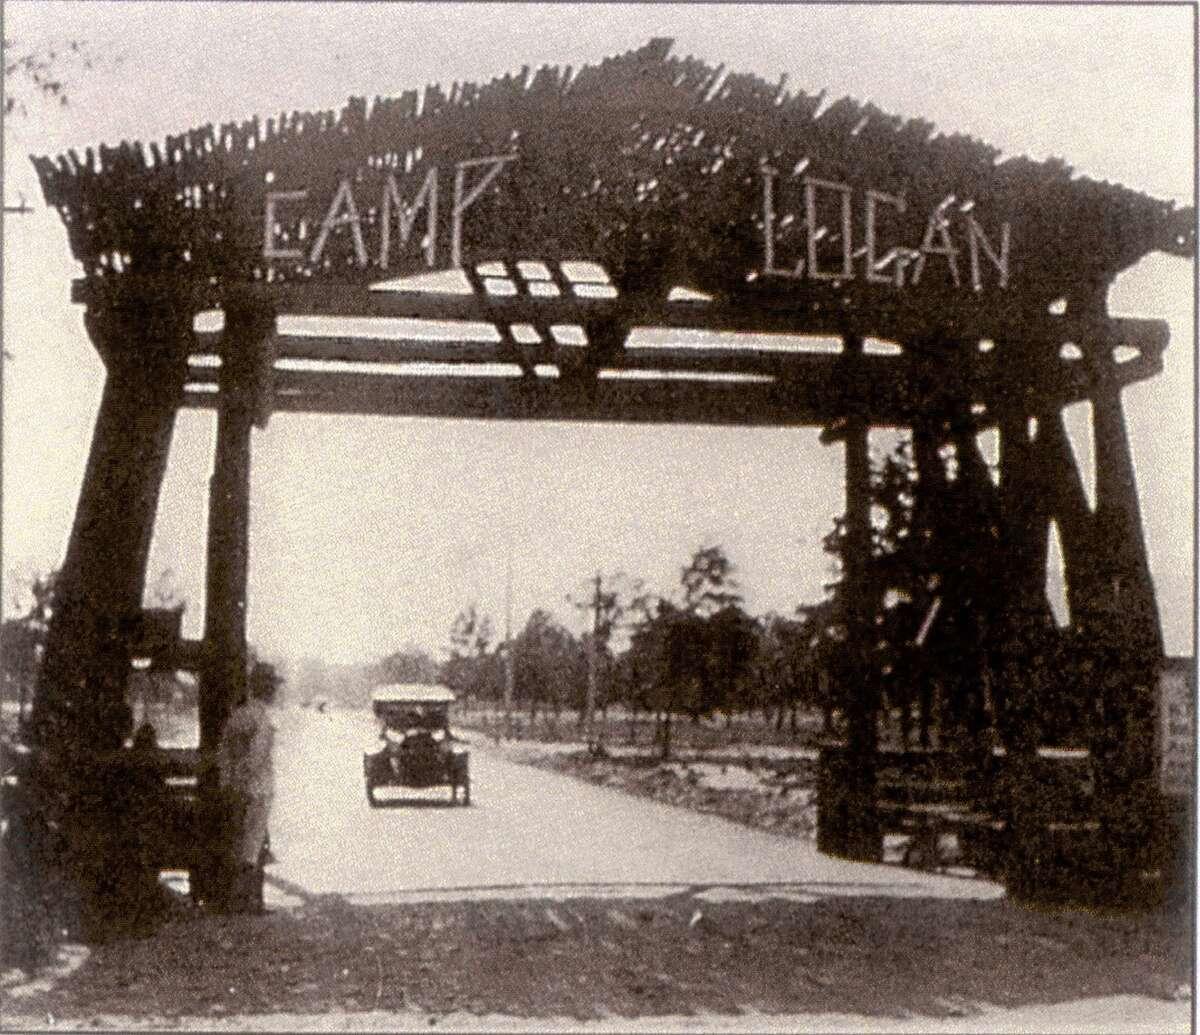 Camp Logan, Circa 1917, now the site of Memorial Park